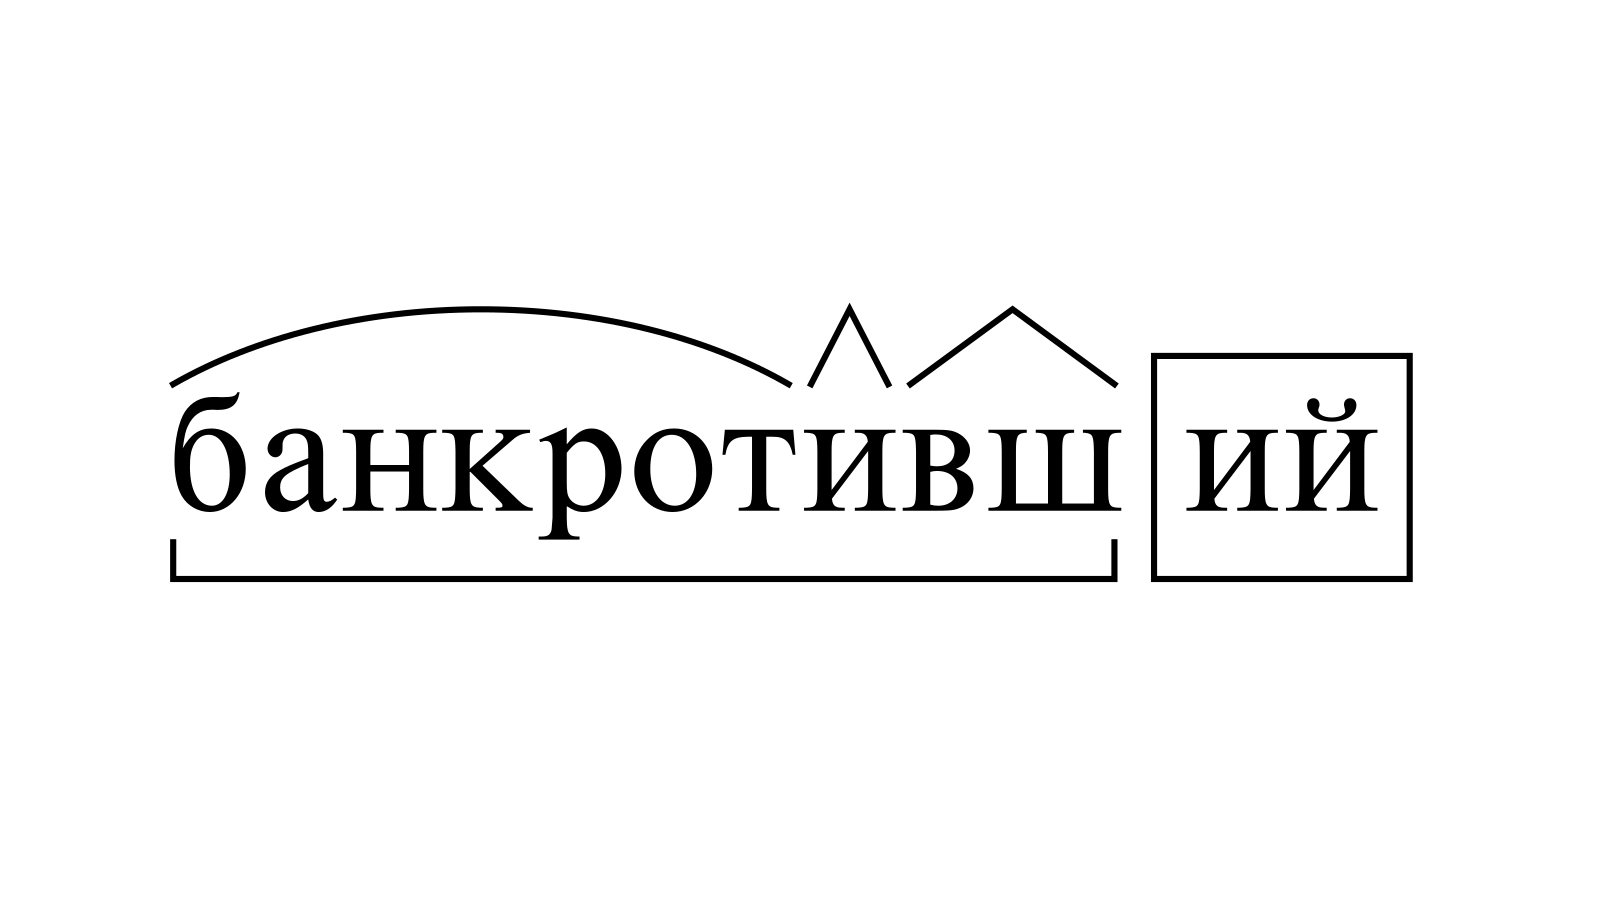 Разбор слова «банкротивший» по составу